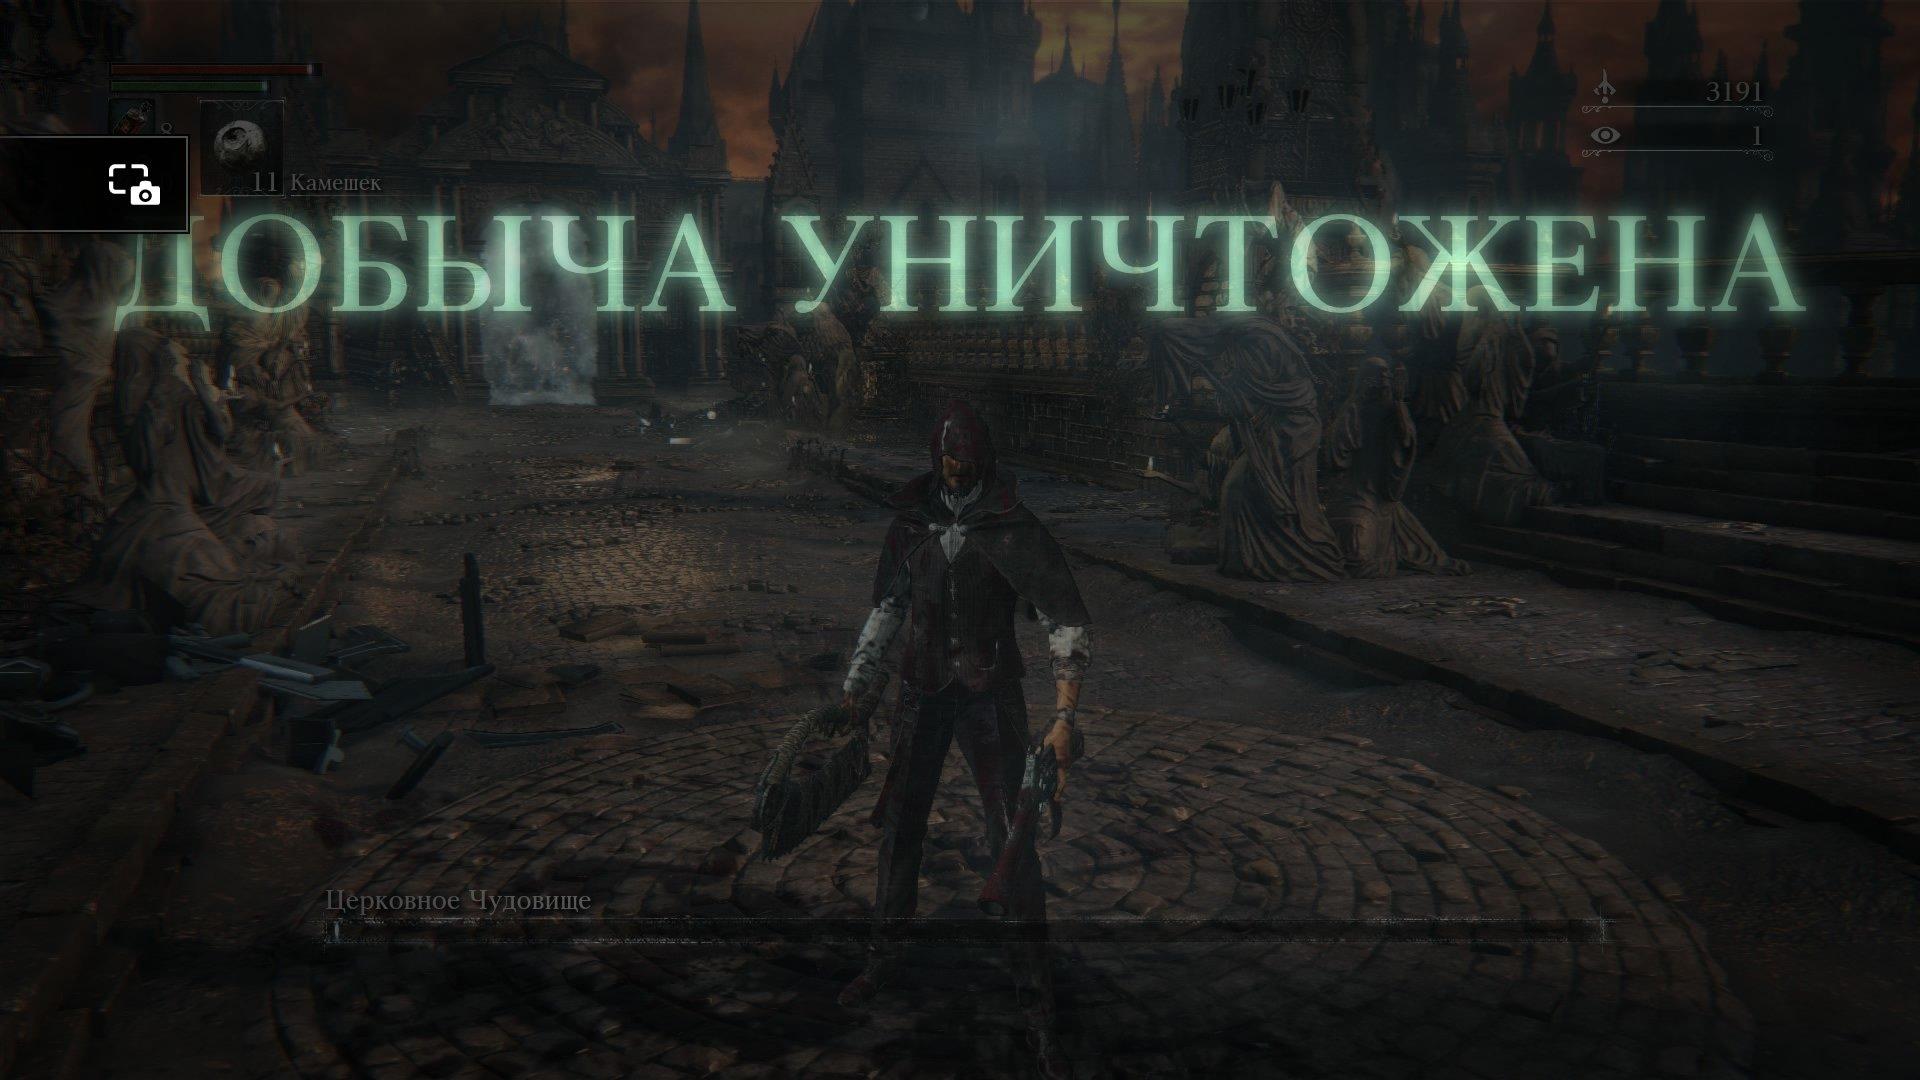 bloodborne церковное чудовище cleric best